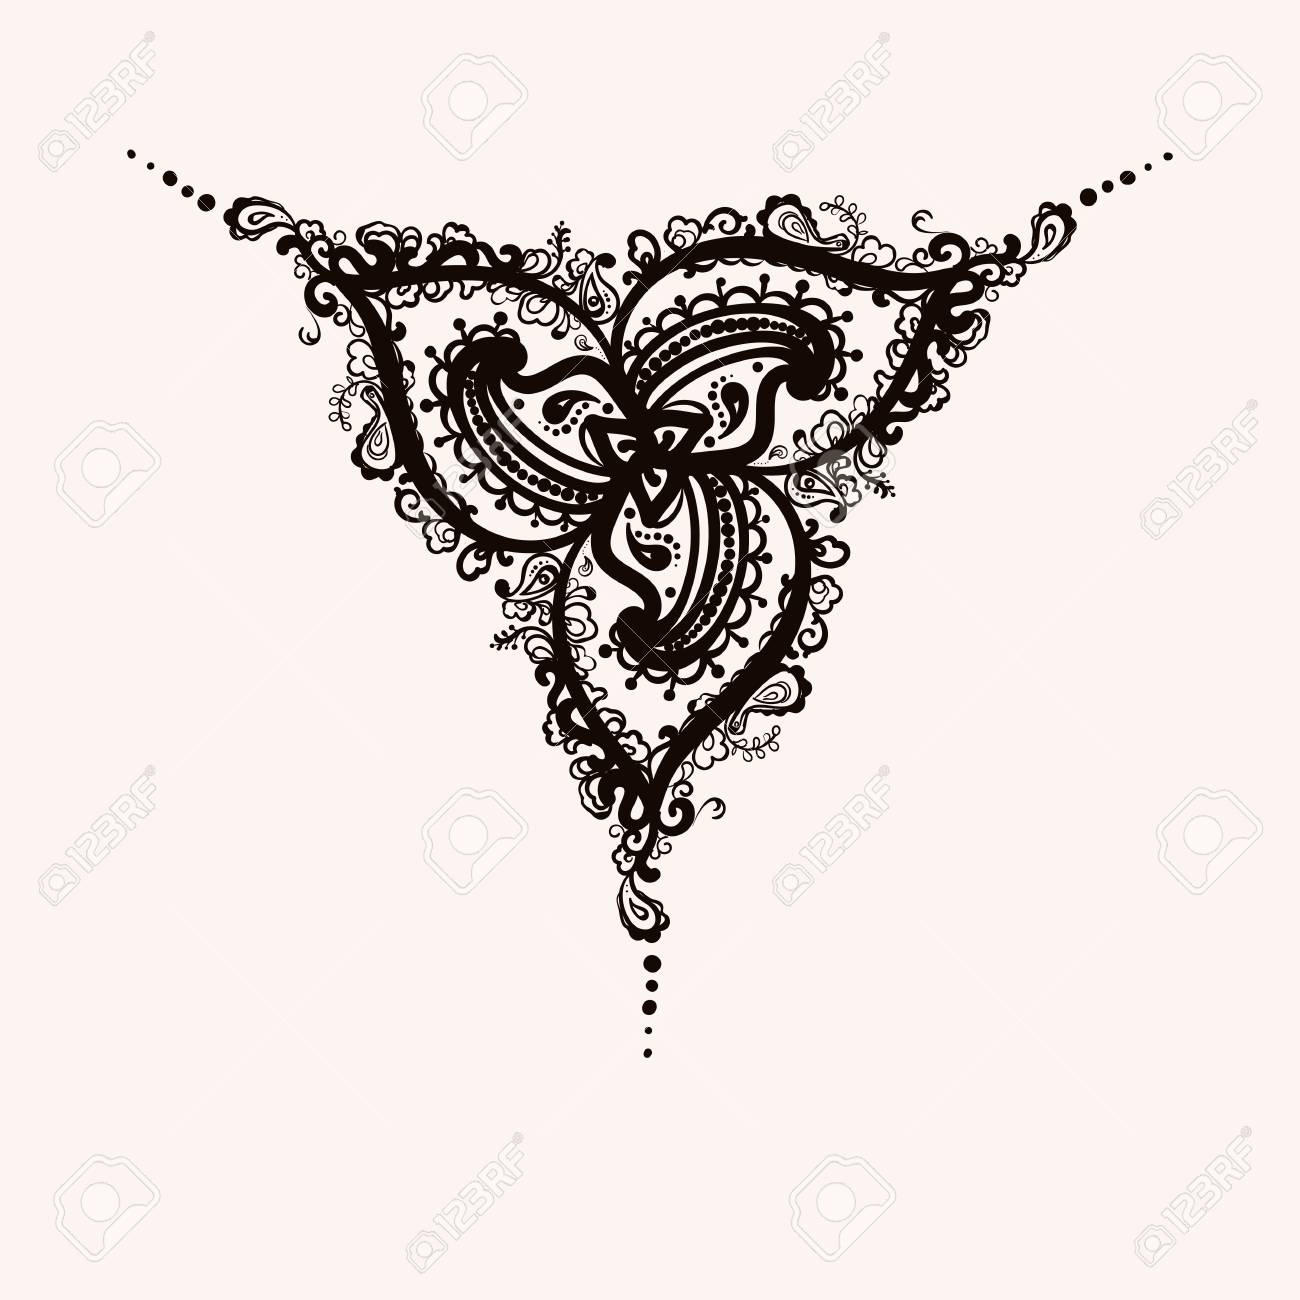 Mehndi Indian Henna Tattoo Hand Drawn Vector Illustration Royalty